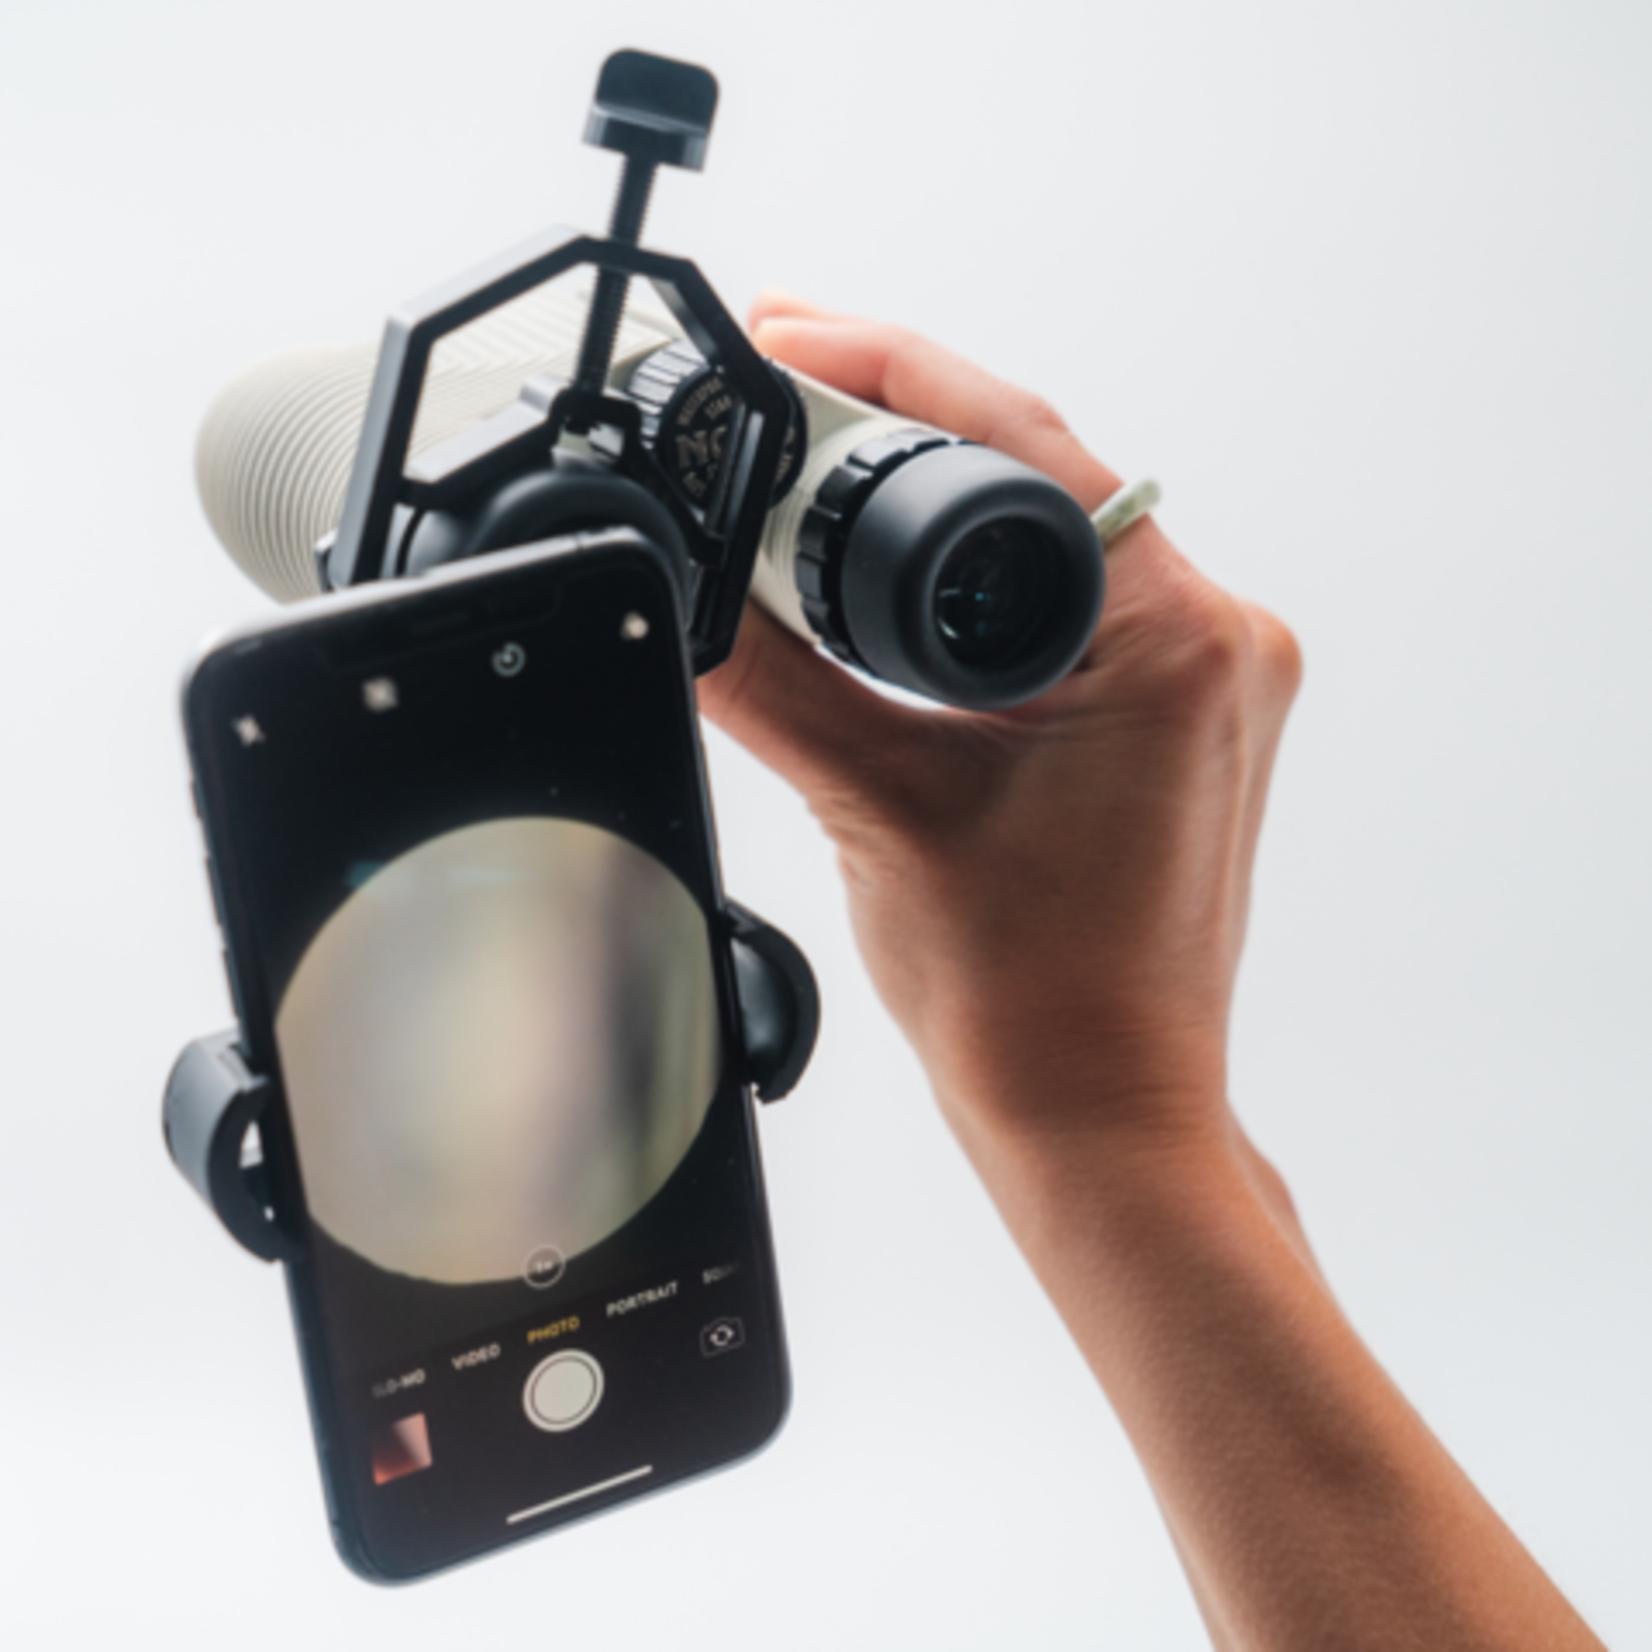 Nocs Provisions NOCS Smartphone Adaptor for Binoculars